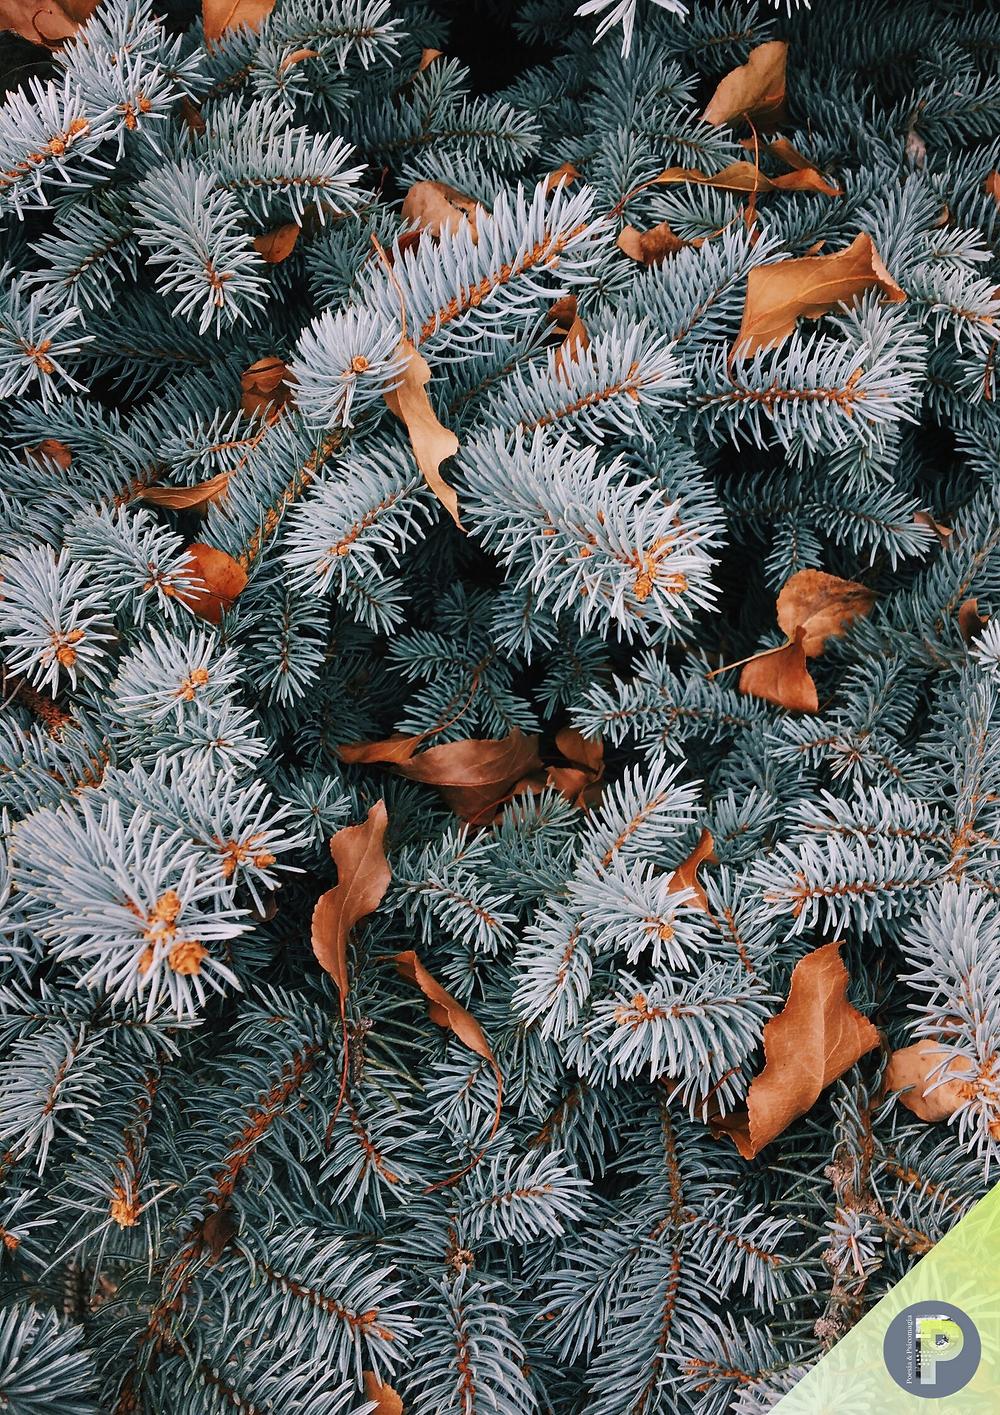 Poesie psicomagiche d'inverno - FEBBRAIO